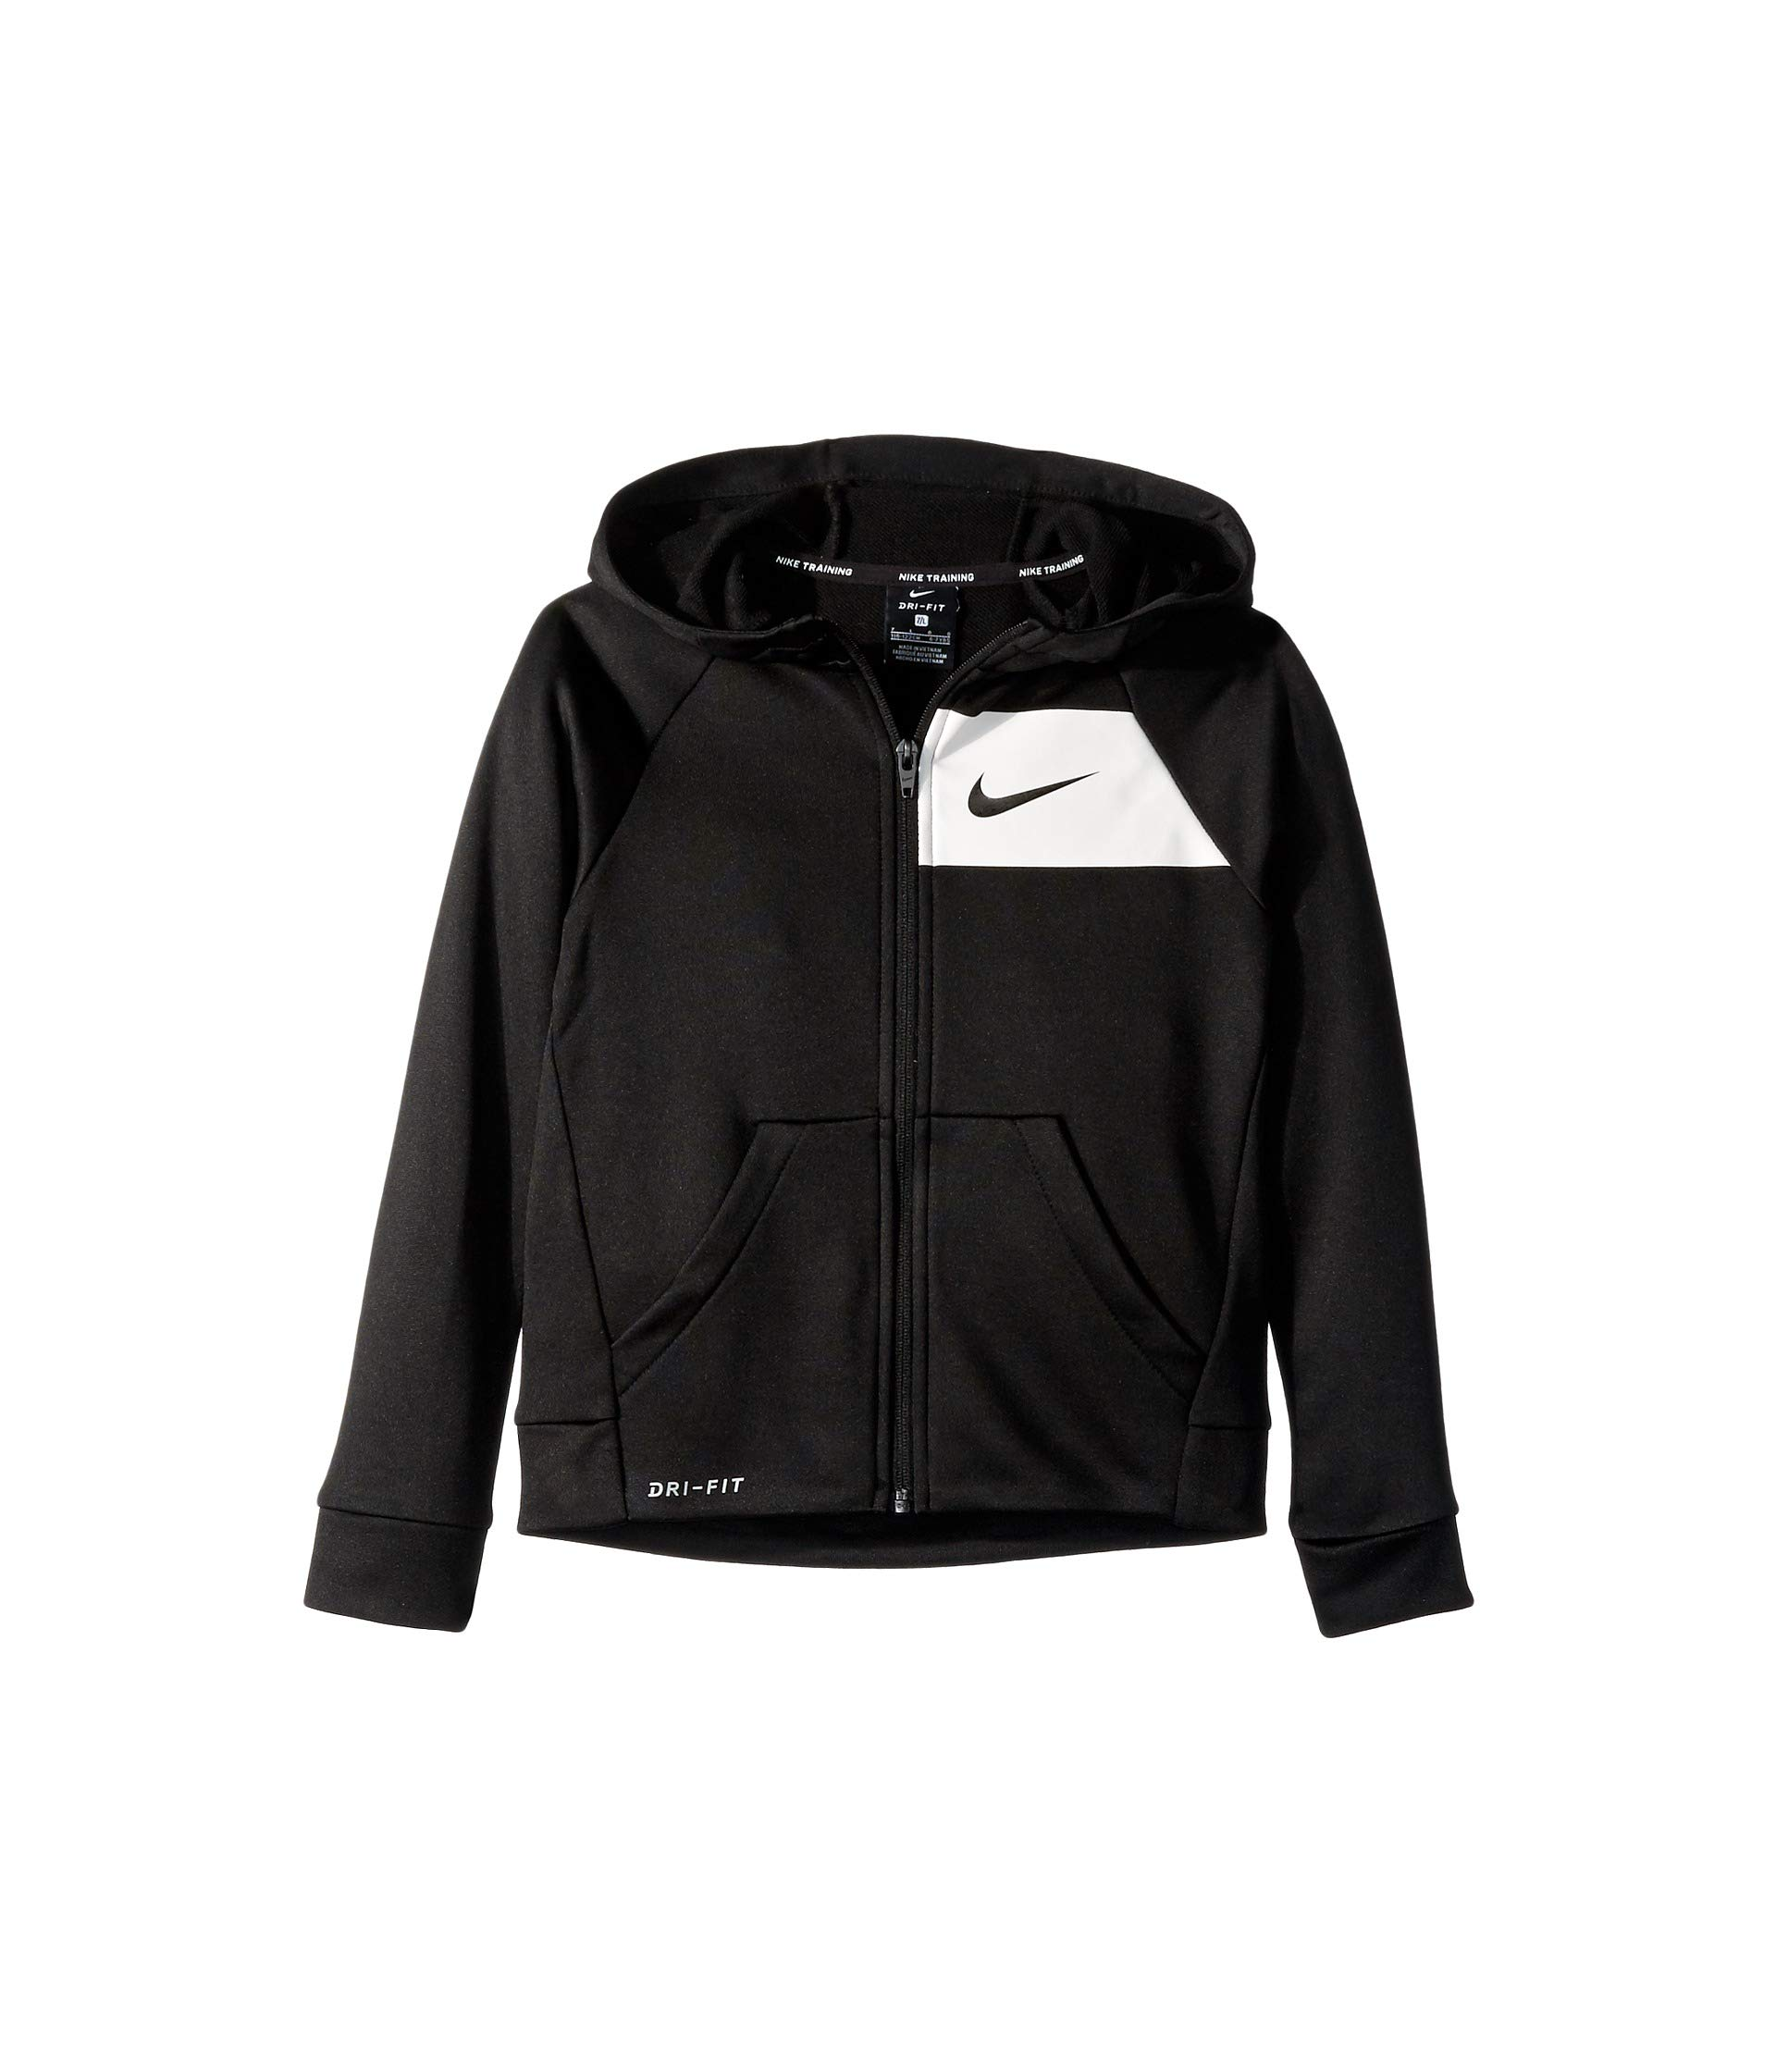 Nike Boys' Dri-Fit Hoodie - Black, 6